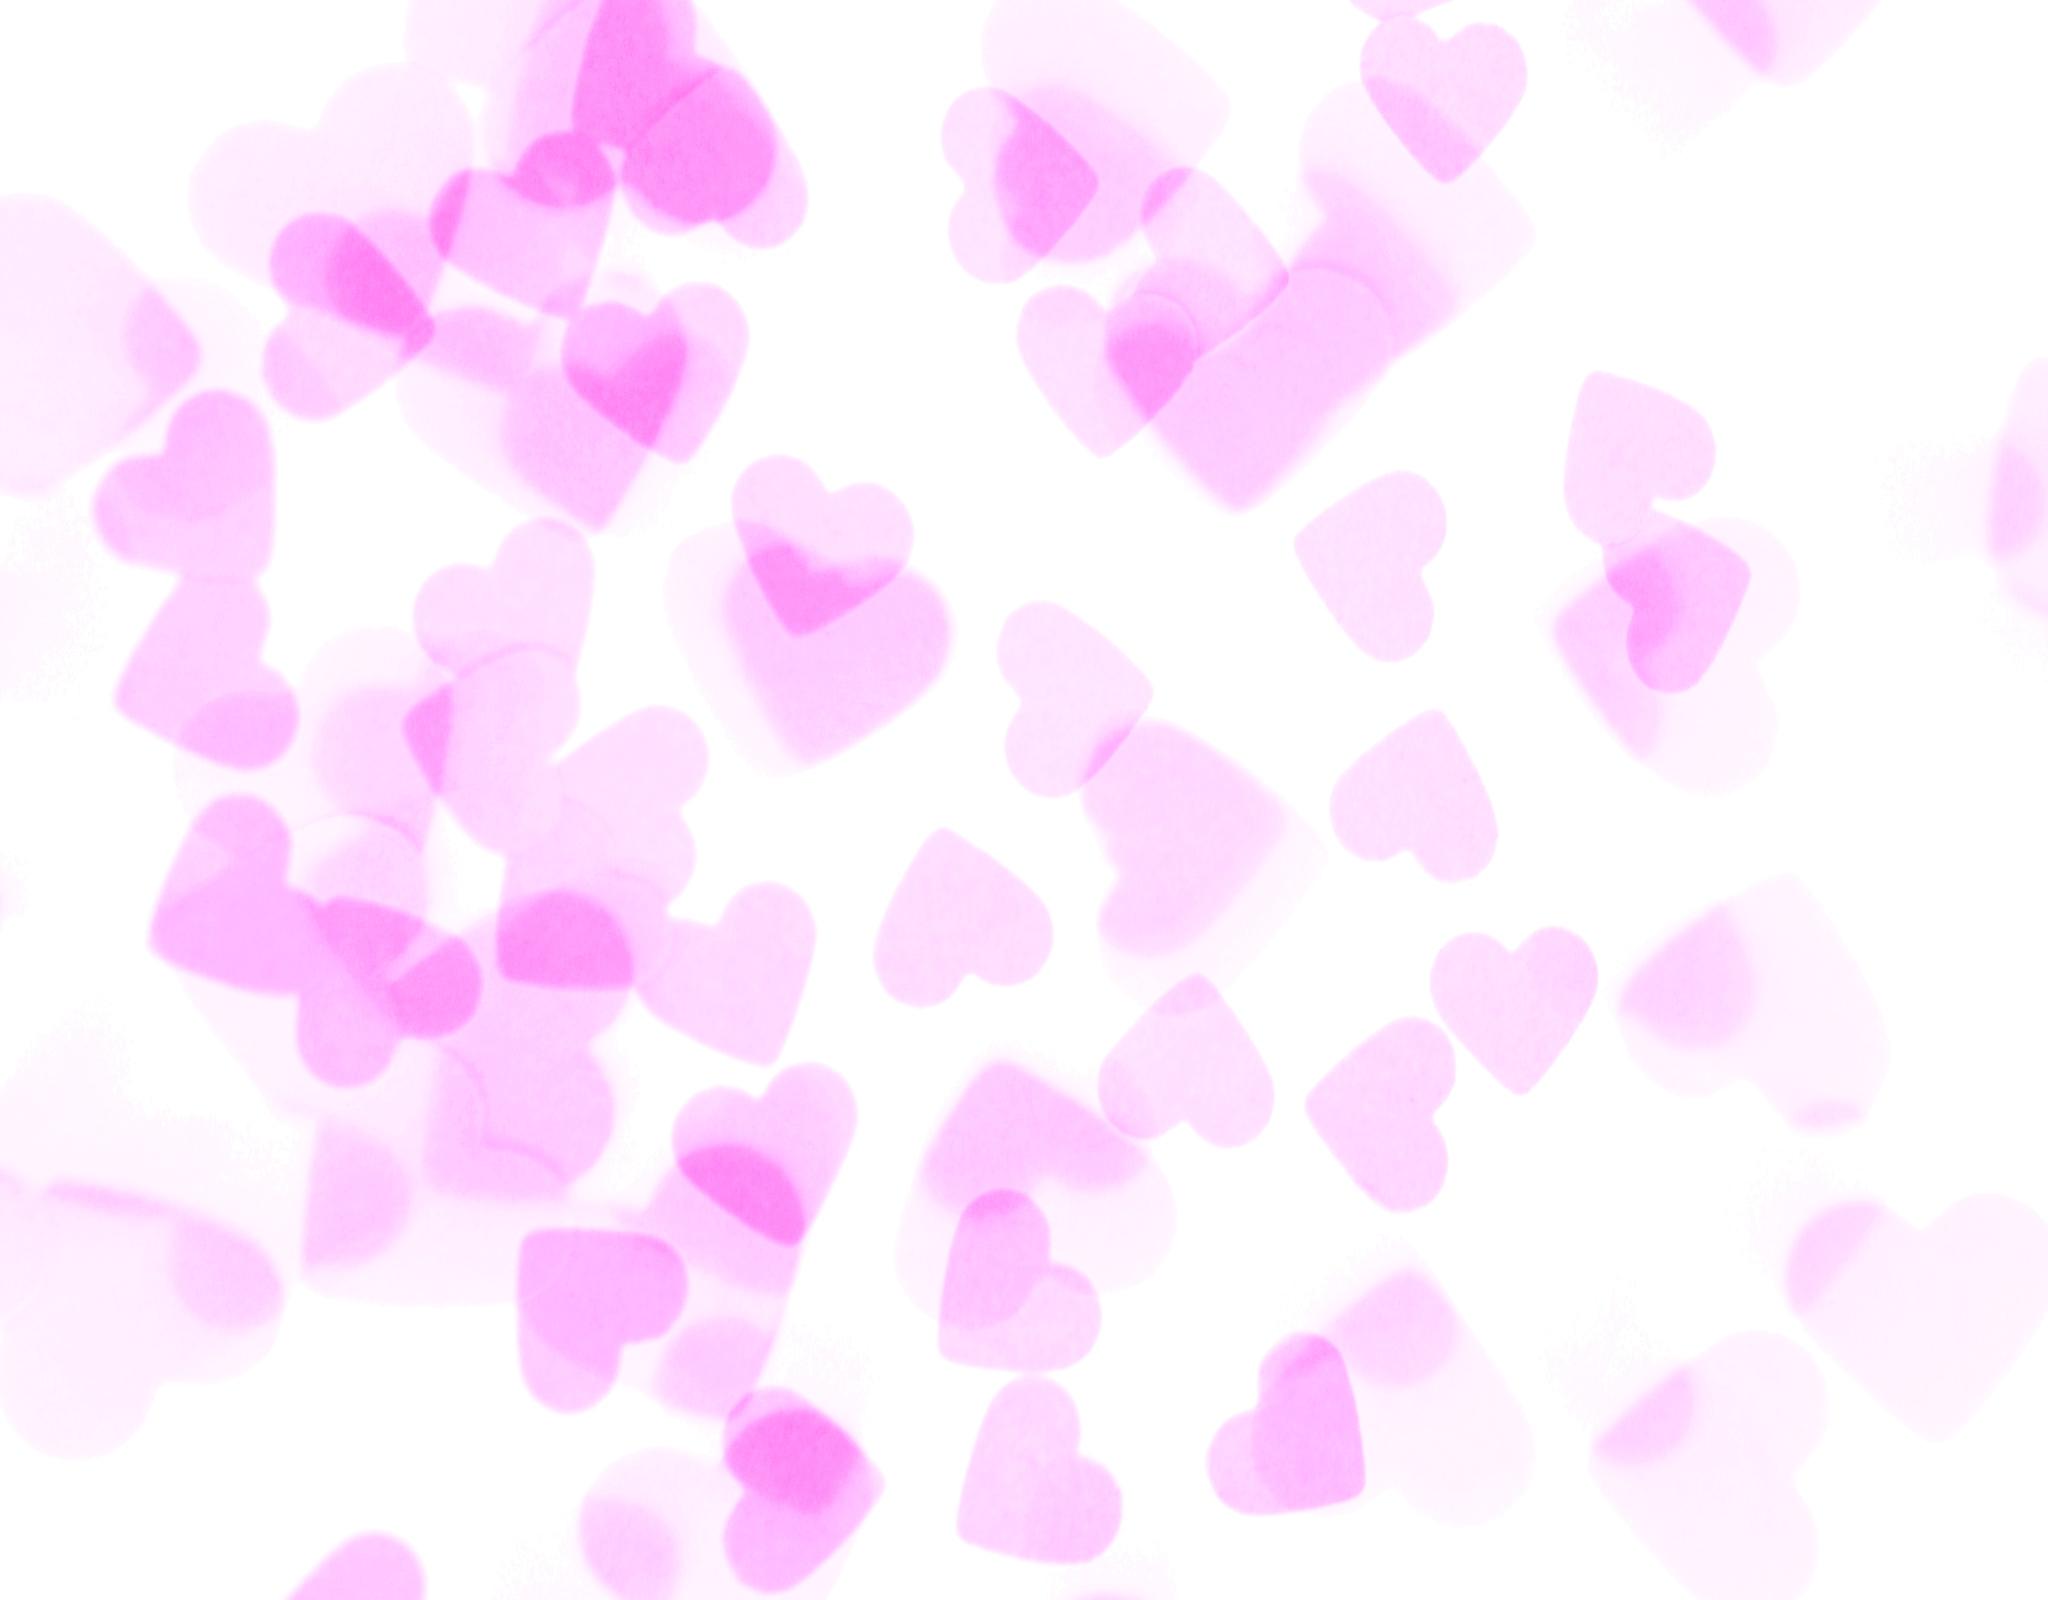 2048x1600 Heart Background 17774 2048x1600 Px ~